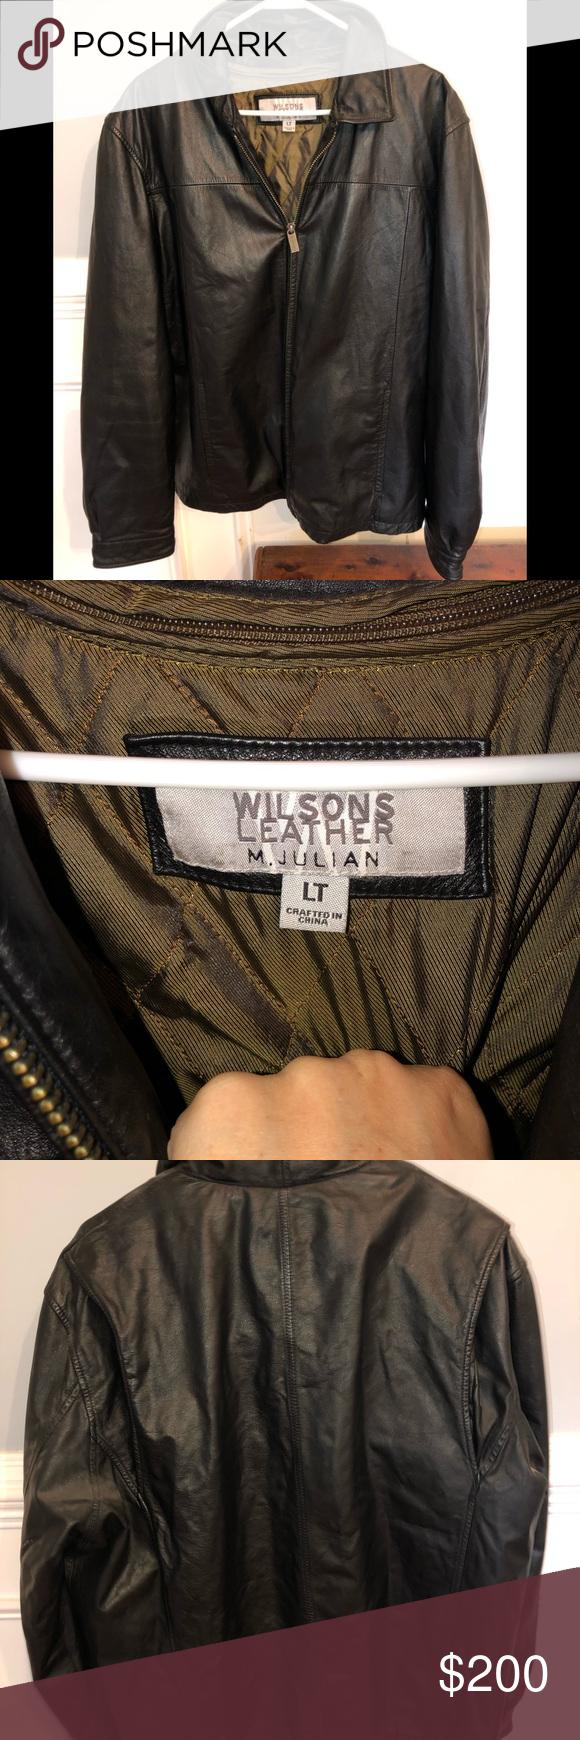 Wilson's leather M. Julian Jacket size large Jackets